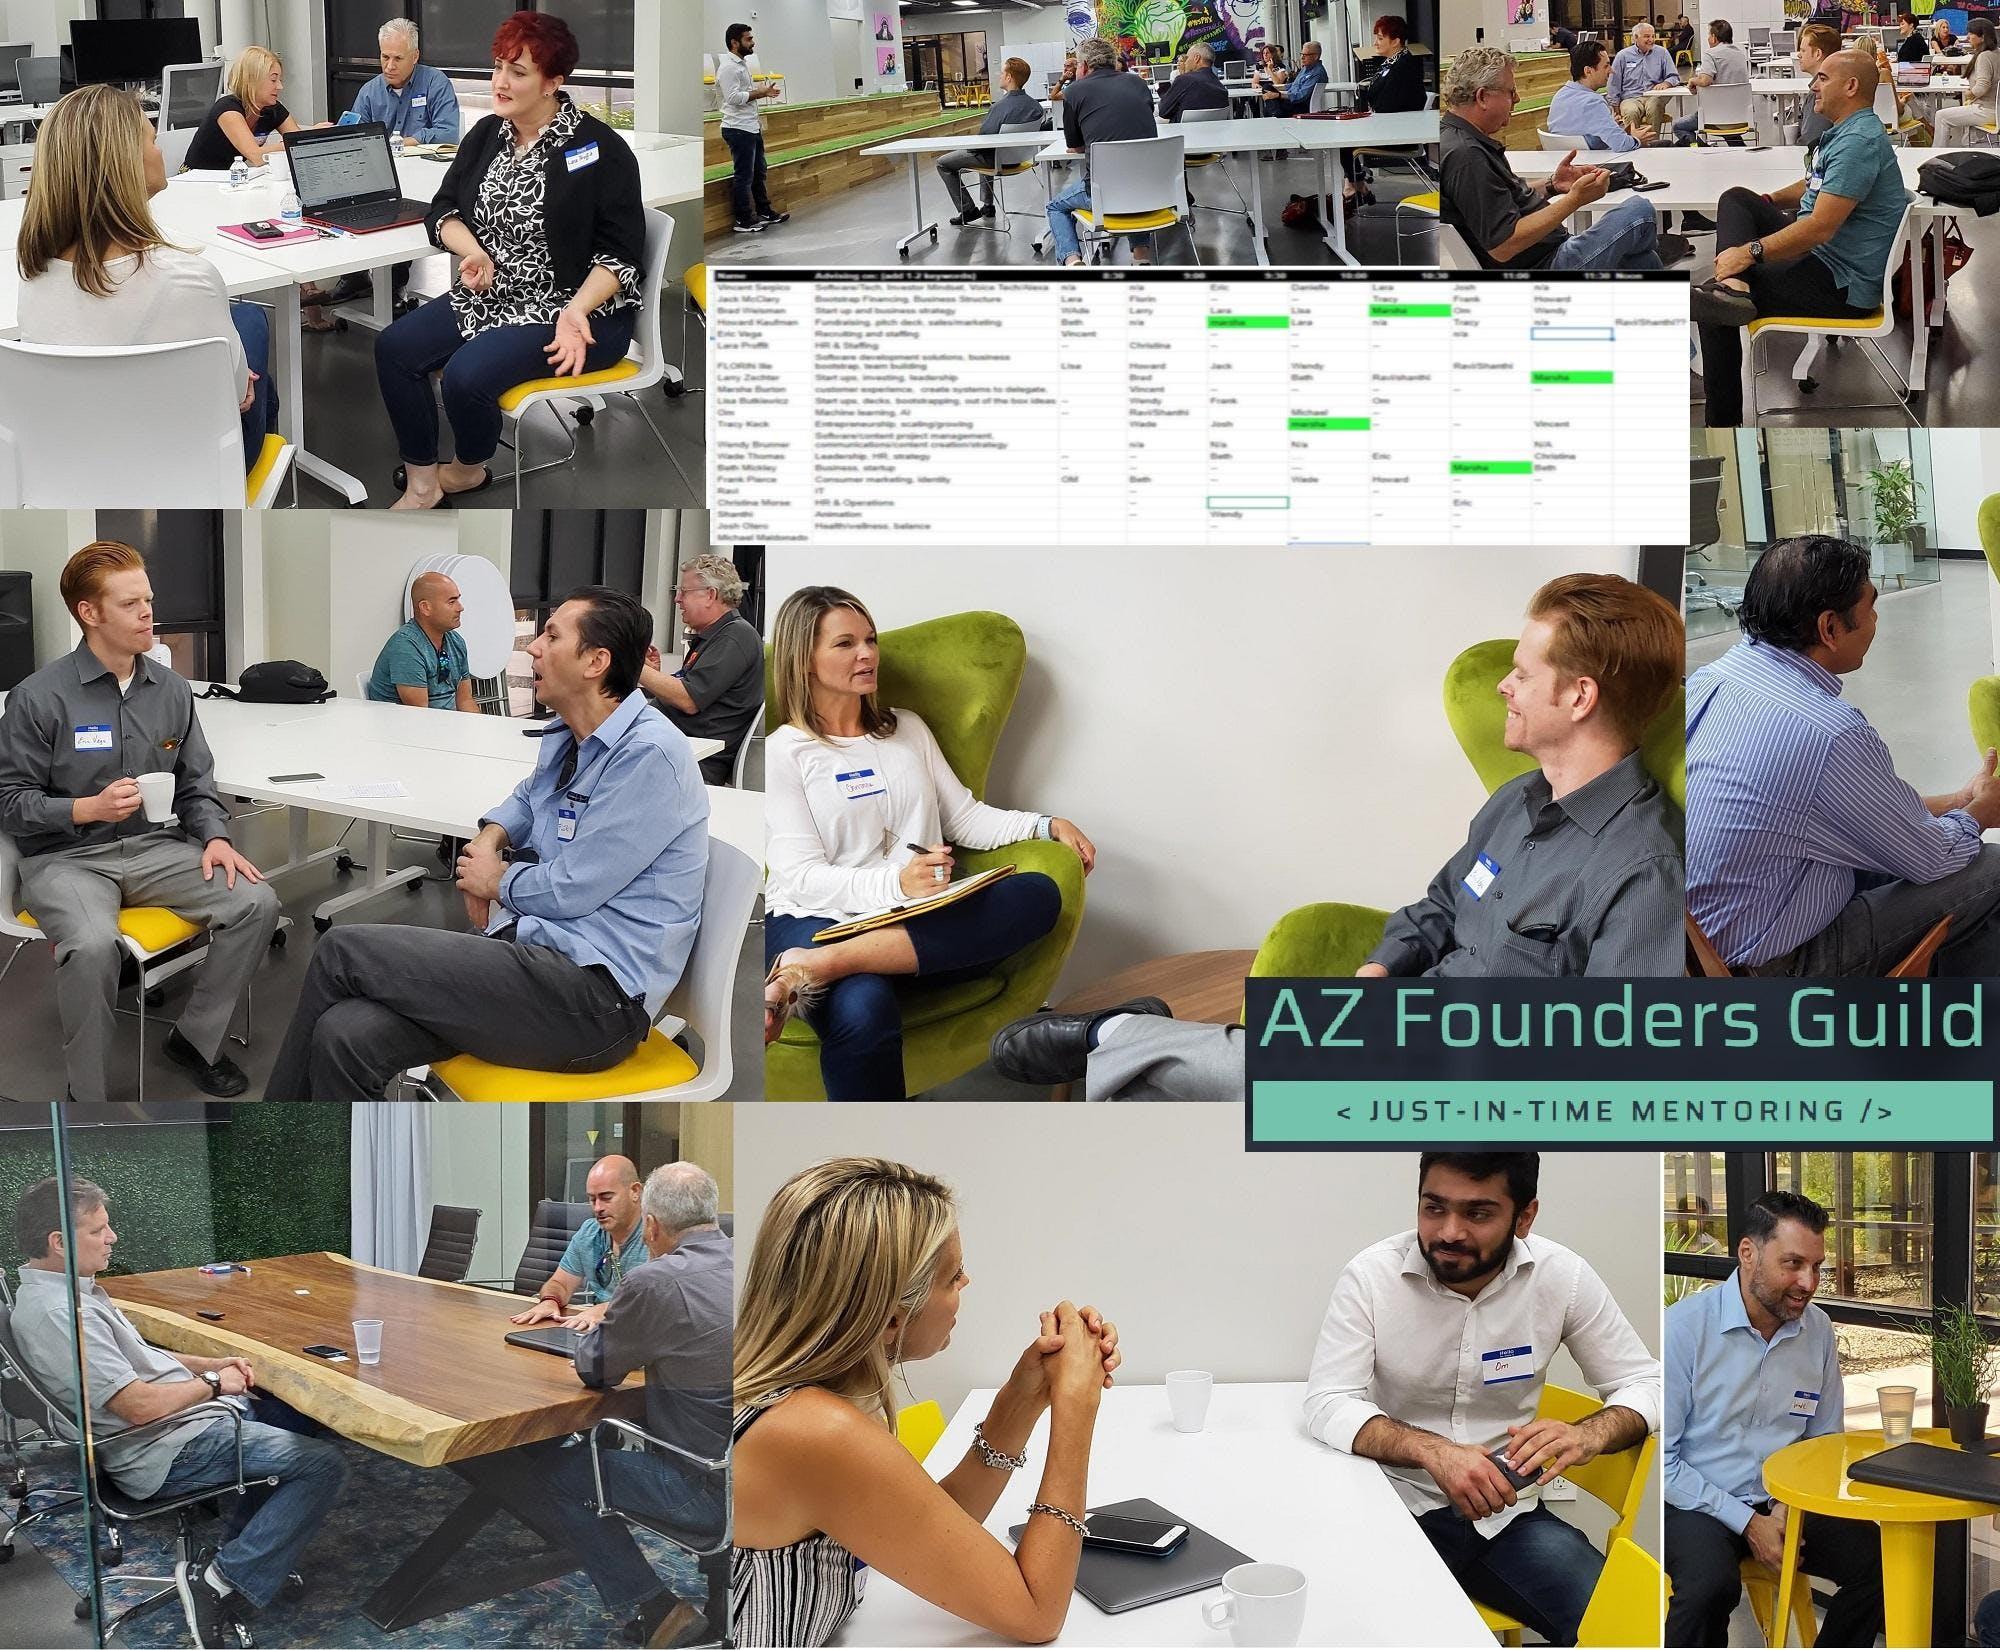 AZ Founders Guild - July Event